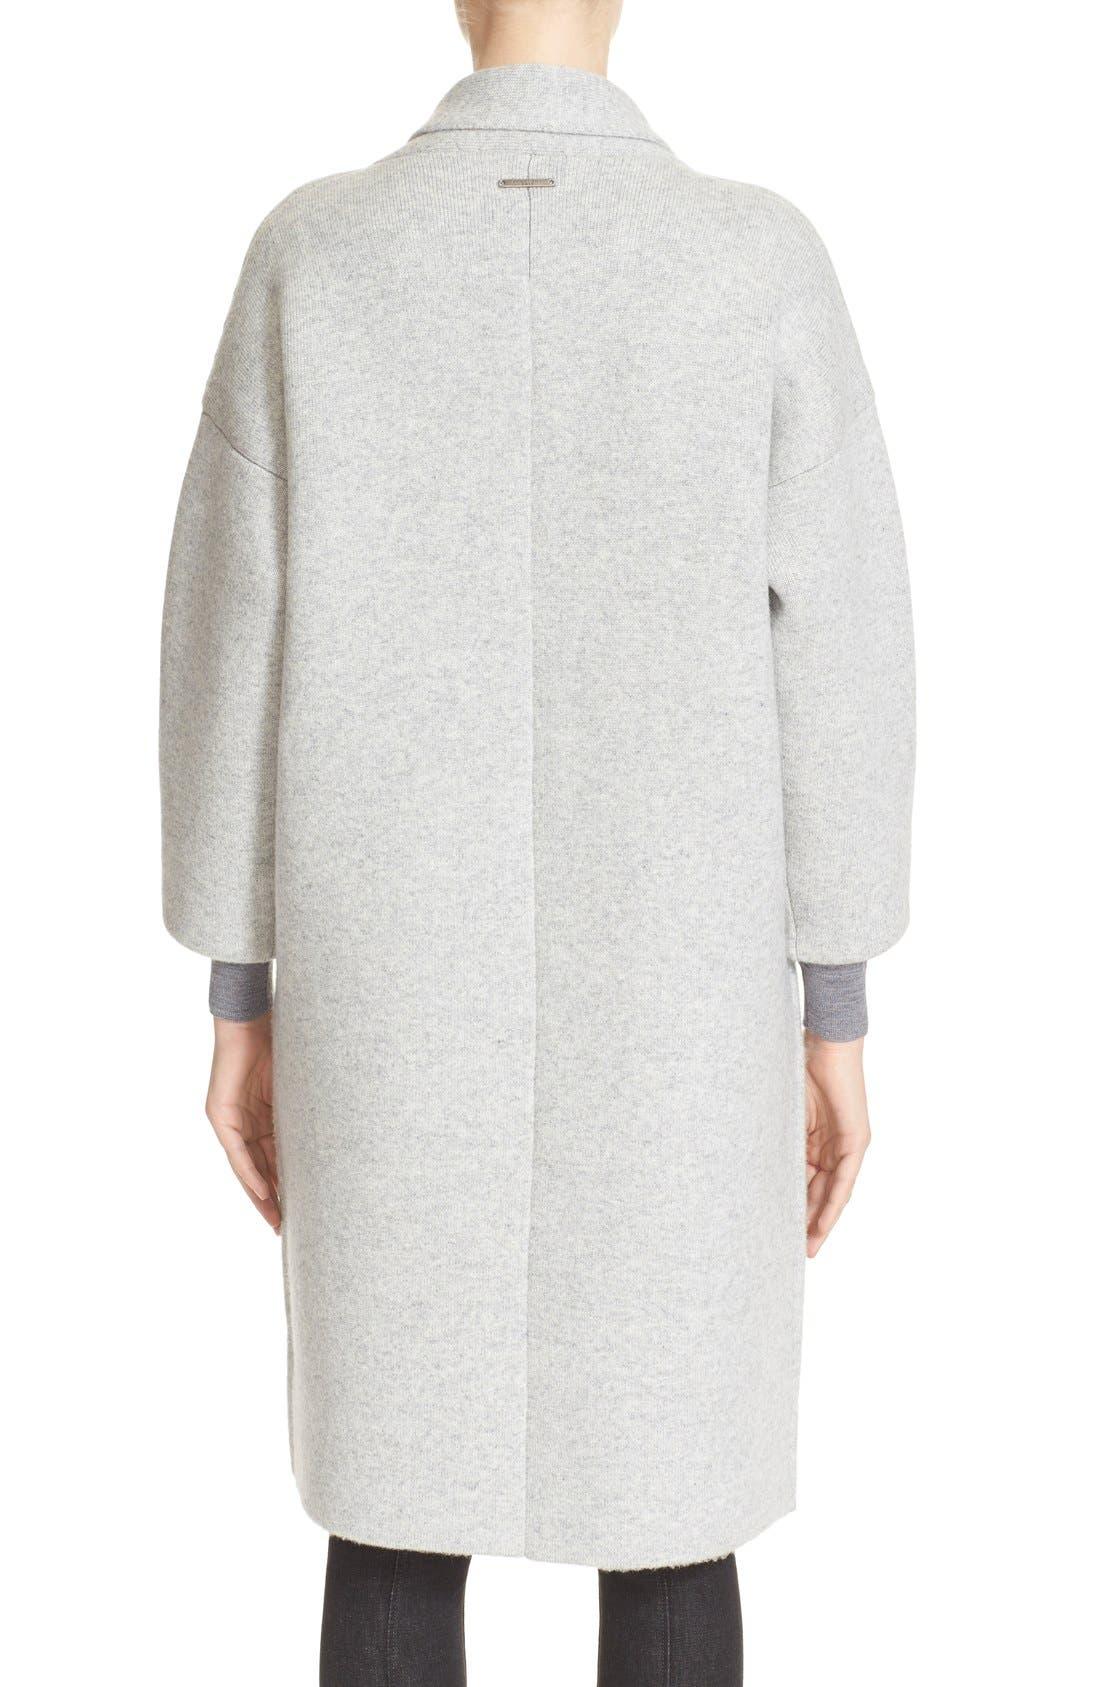 Alternate Image 2  - Burberry Brit Wool & Cashmere Knit Long Coat